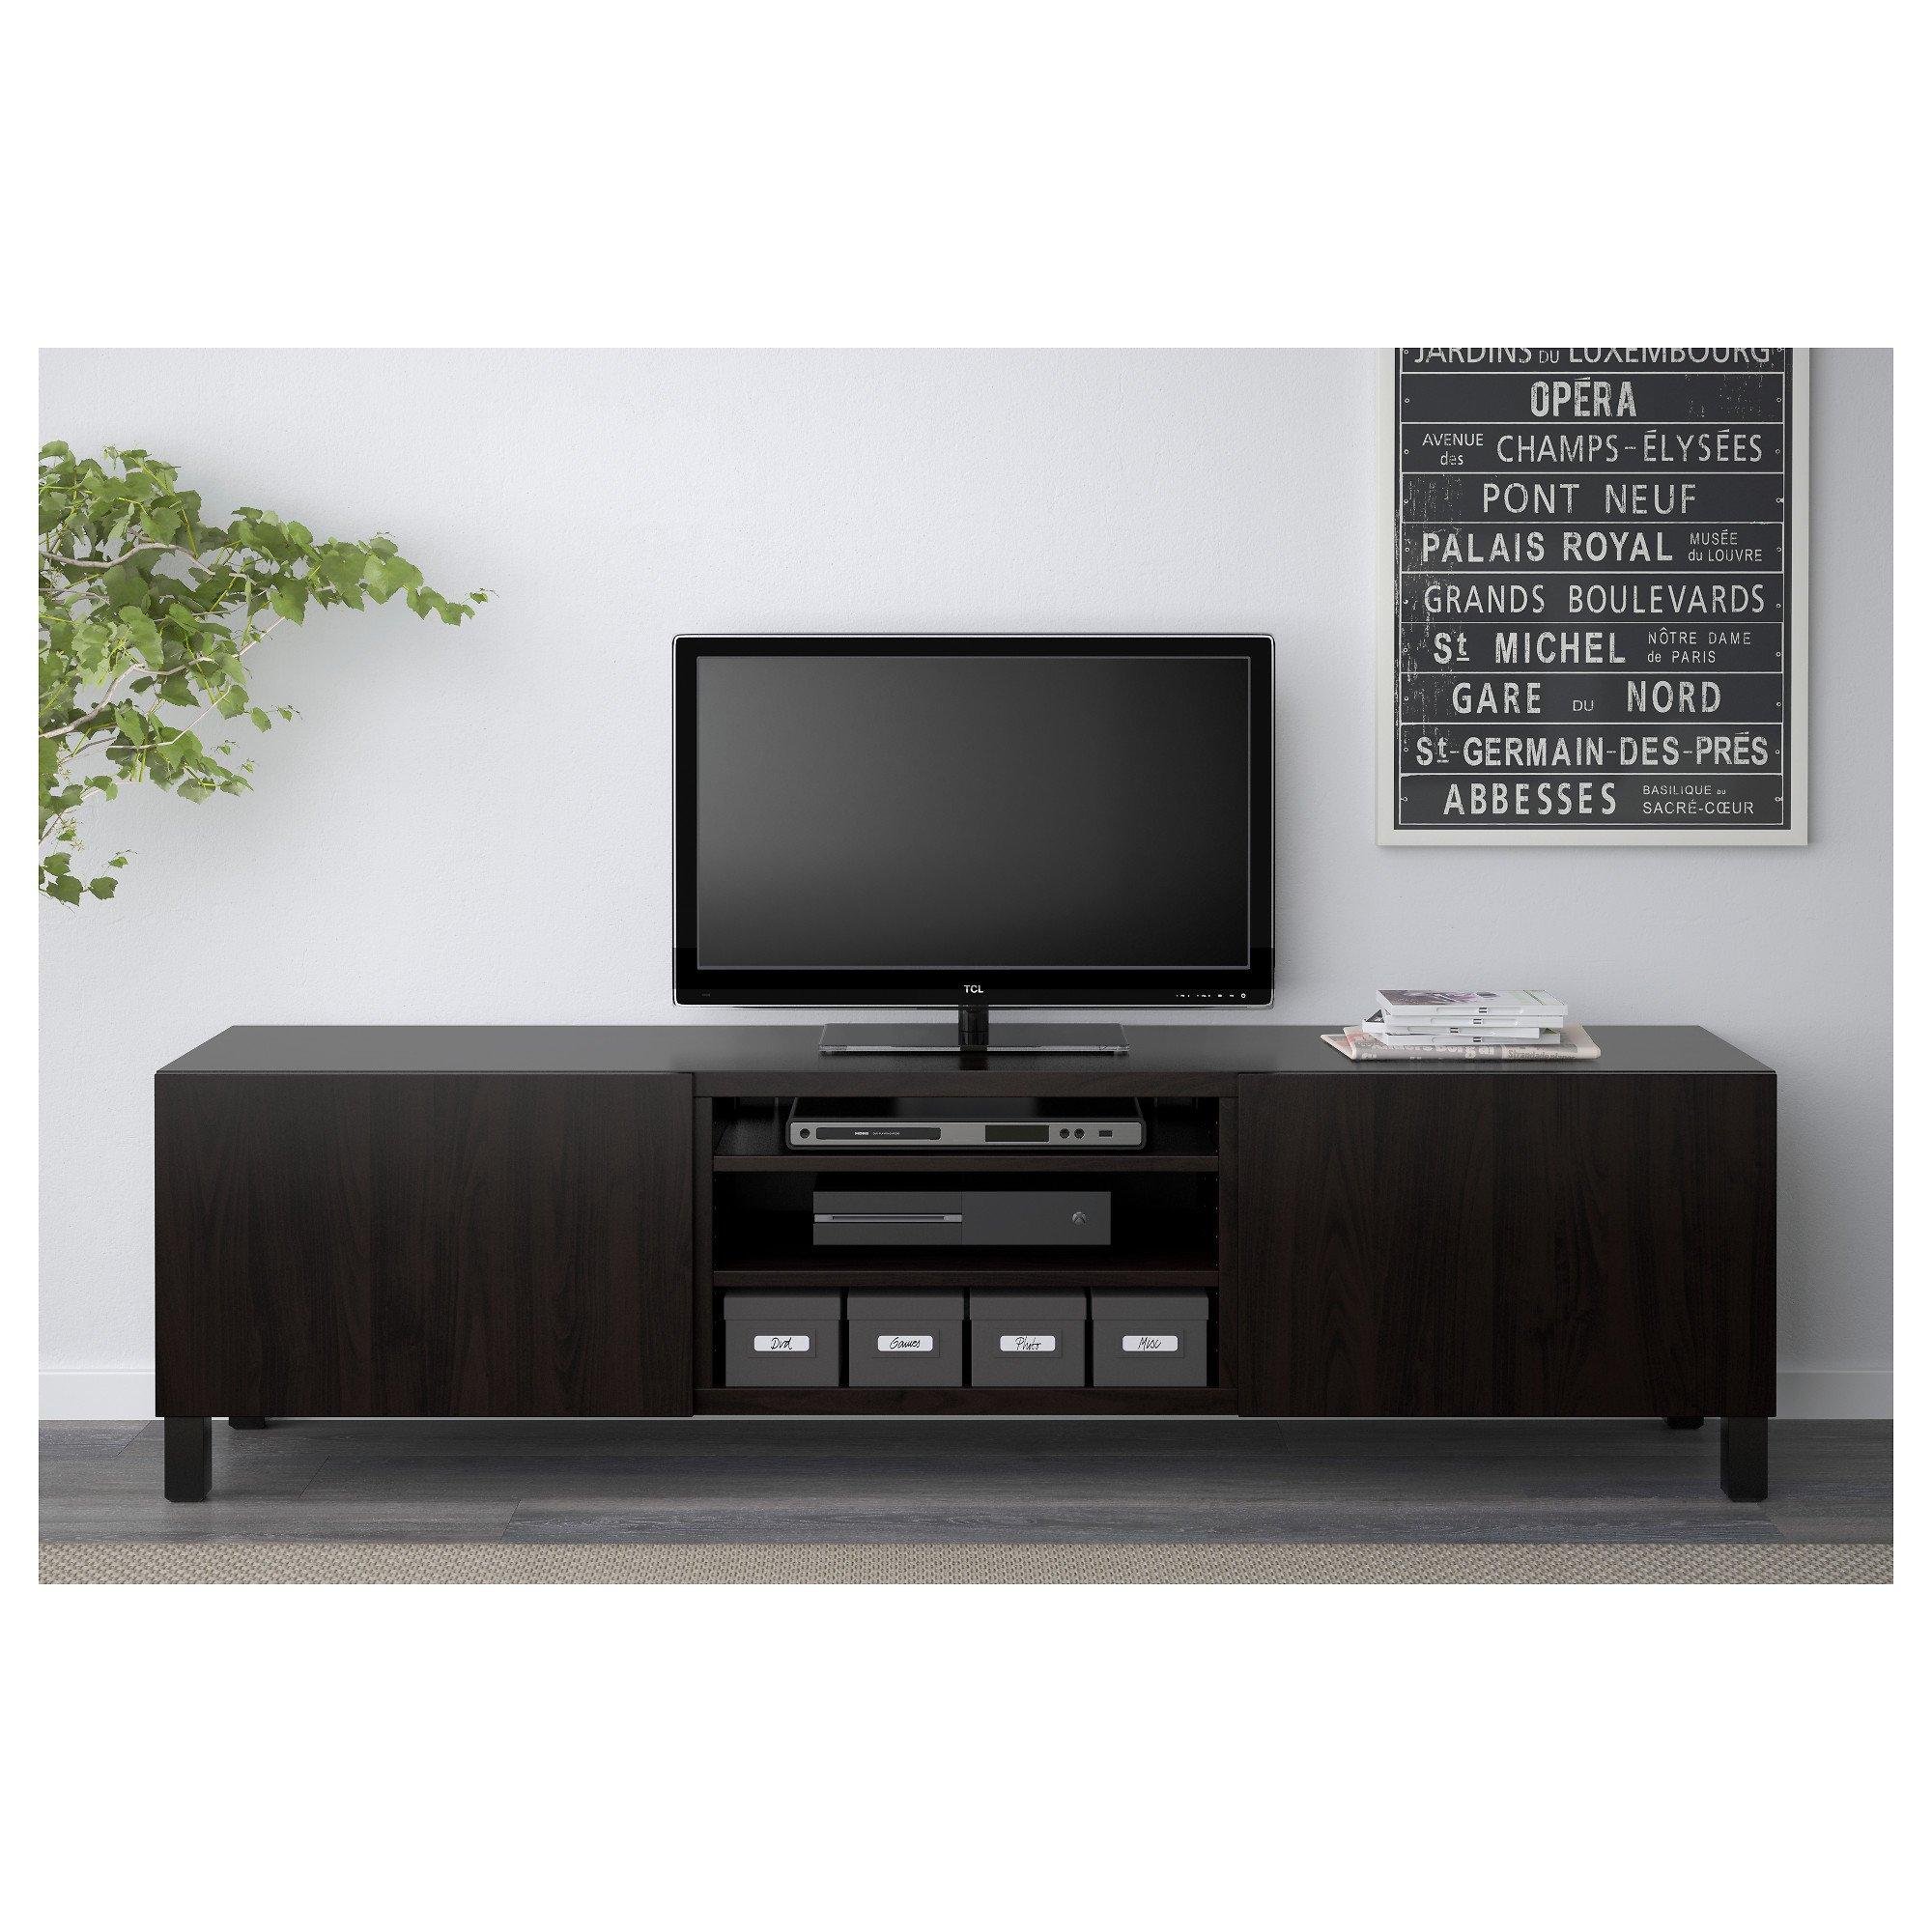 Zigzag Trading Ltd IKEA BESTA - Mueble TV con cajones Lappviken ...